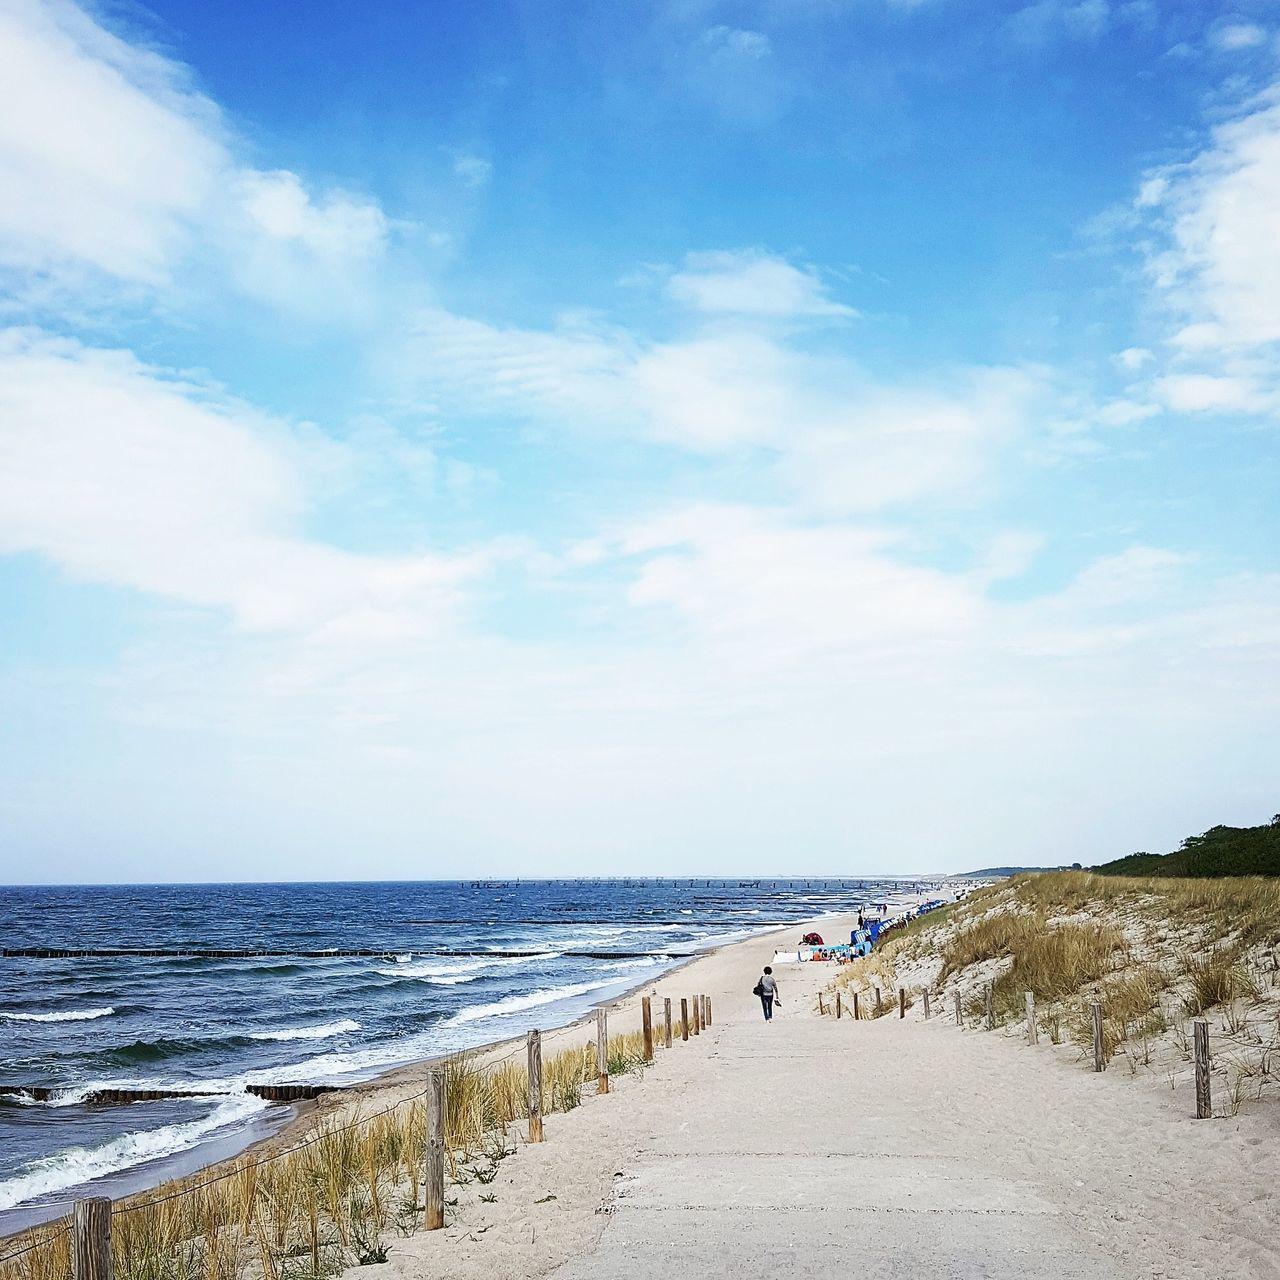 Baltic Sea Summer Sand Clouds Ostsee Sea Meer Sommer Wolken Himmel Heaven Ways Himmel